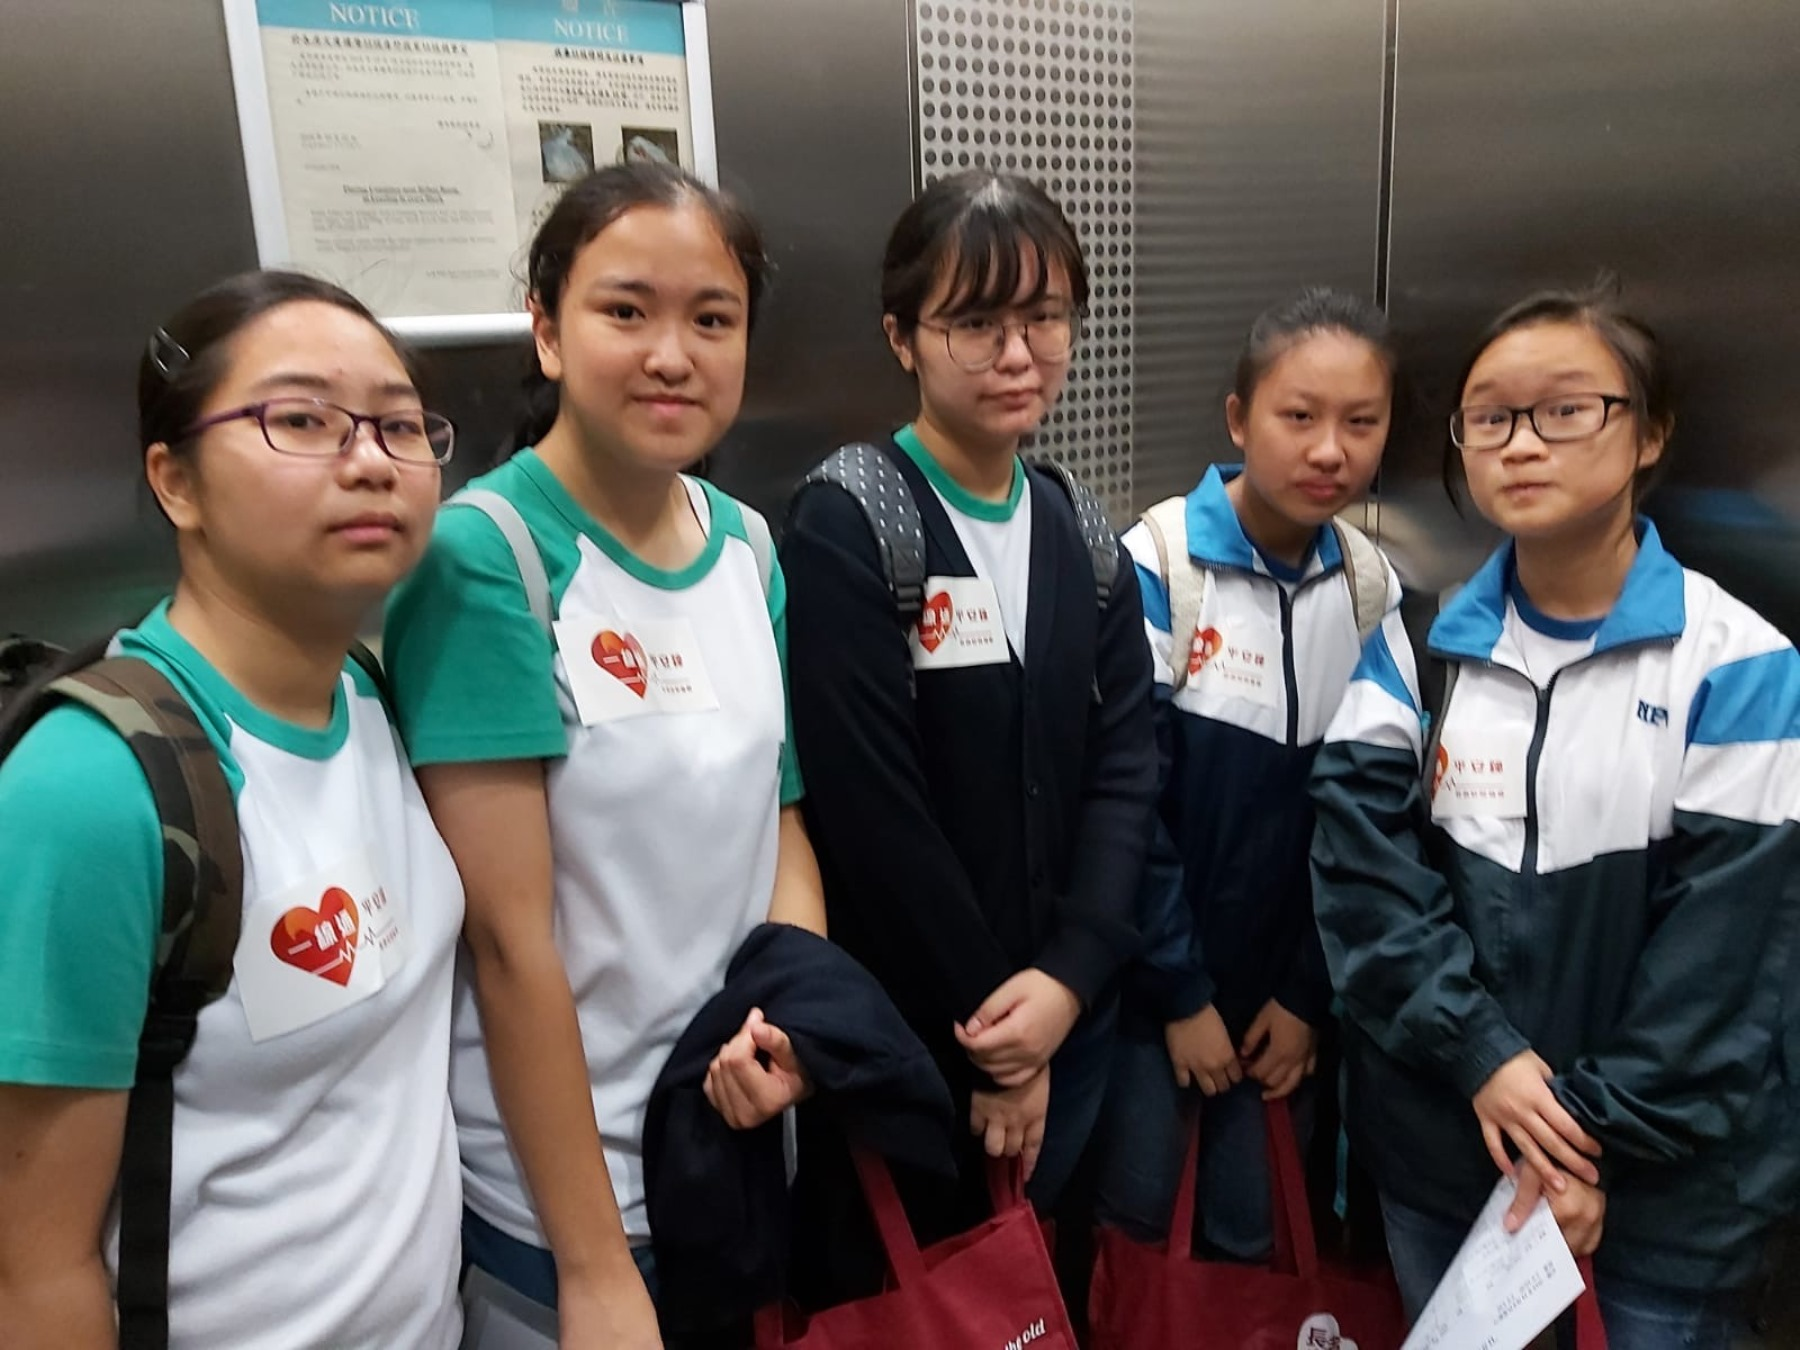 http://npc.edu.hk/sites/default/files/5_969.jpg